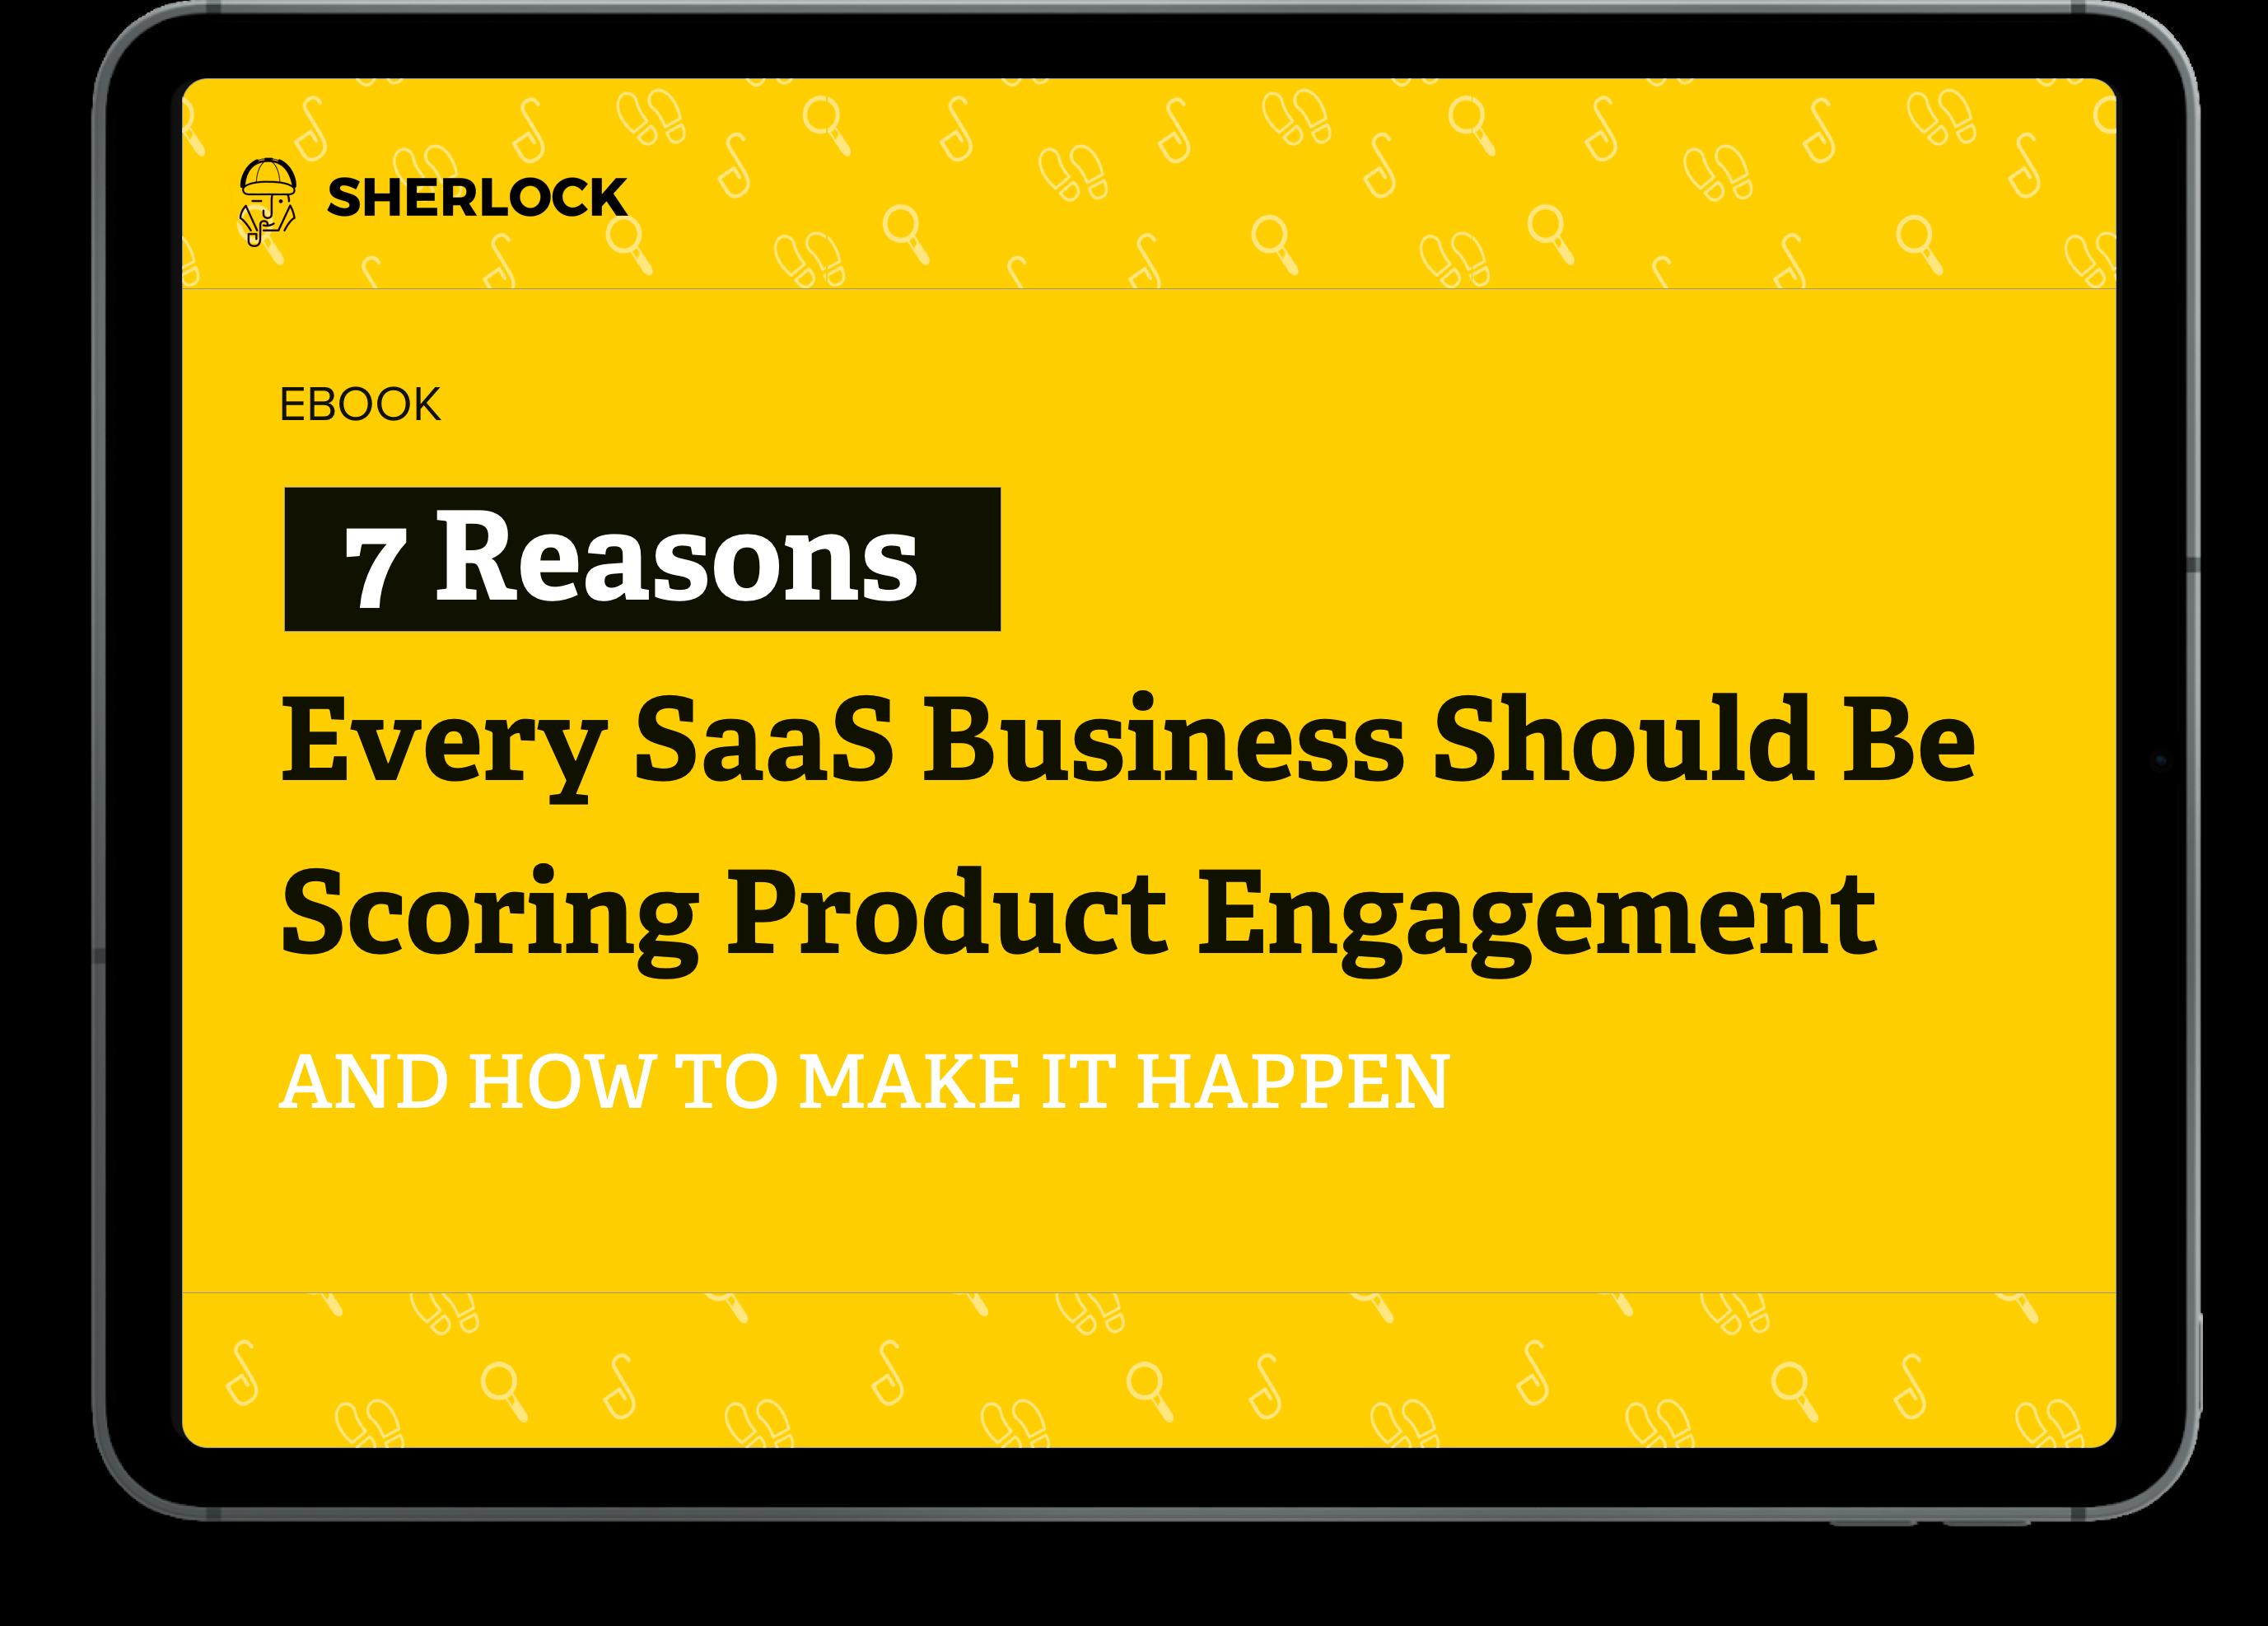 scoring product engagement